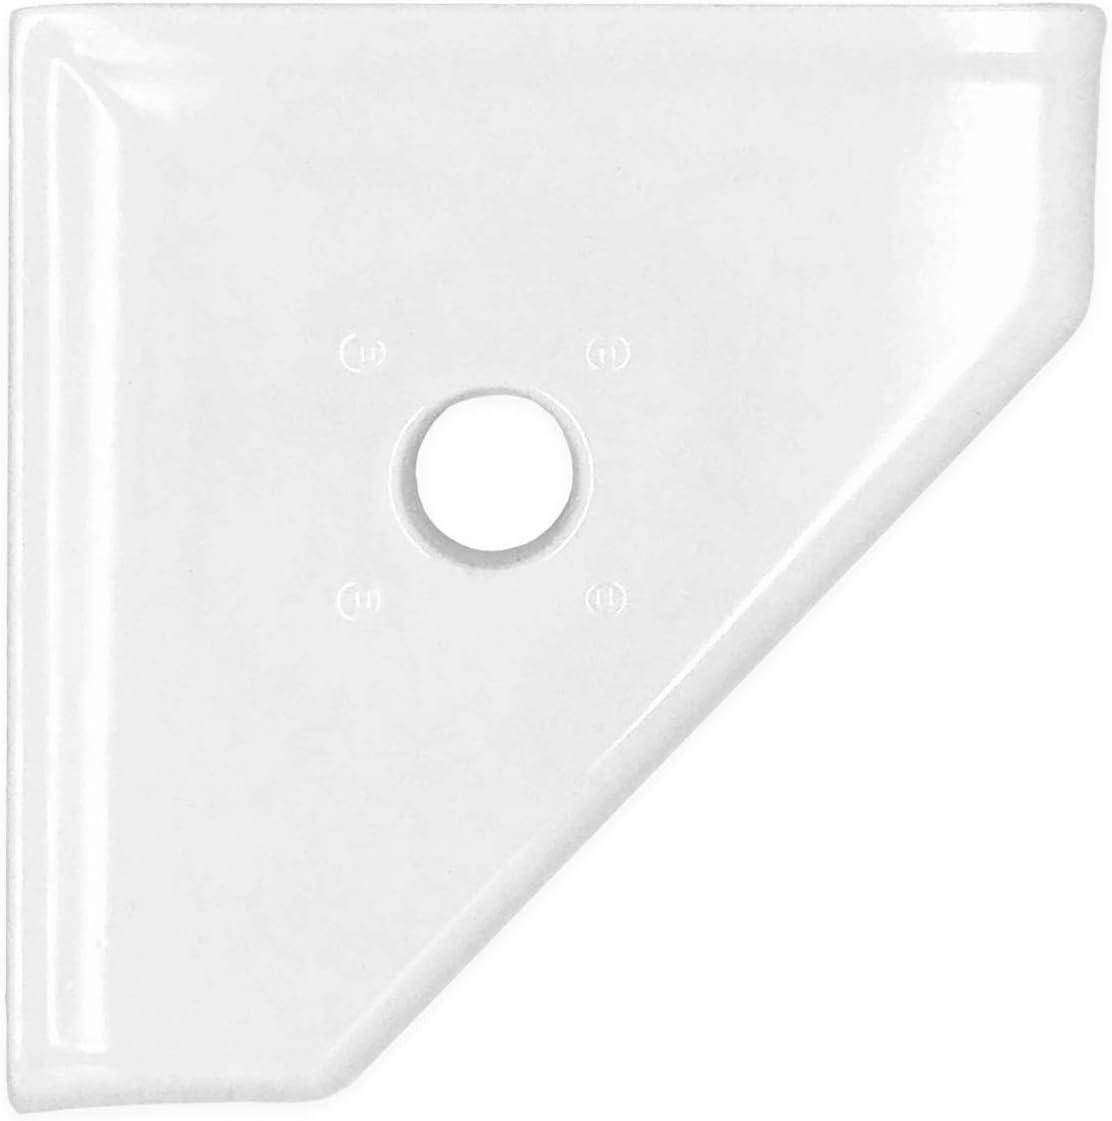 Questech 5 inch Shower Caddy Soap Dish - Polished Bright White Corner Soap Tray Geo Wall Mounted Flatback Shelf